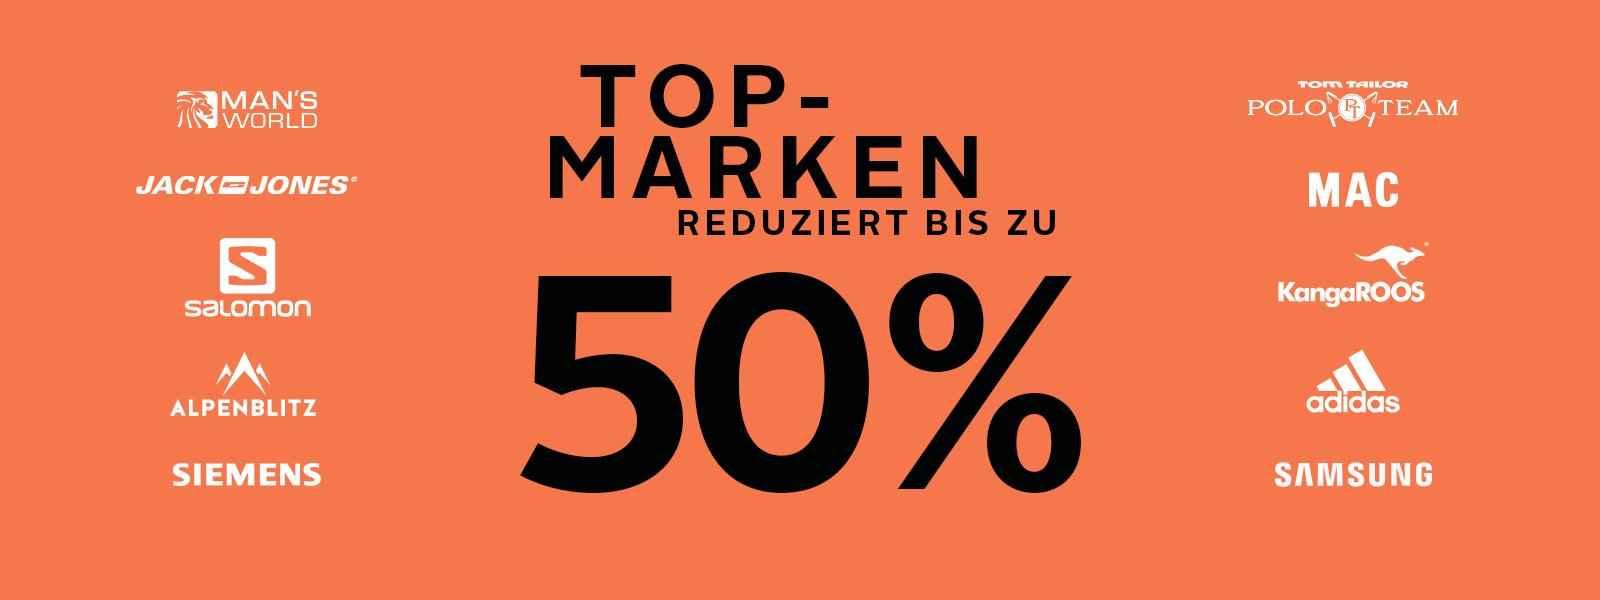 Top Marken reduziert